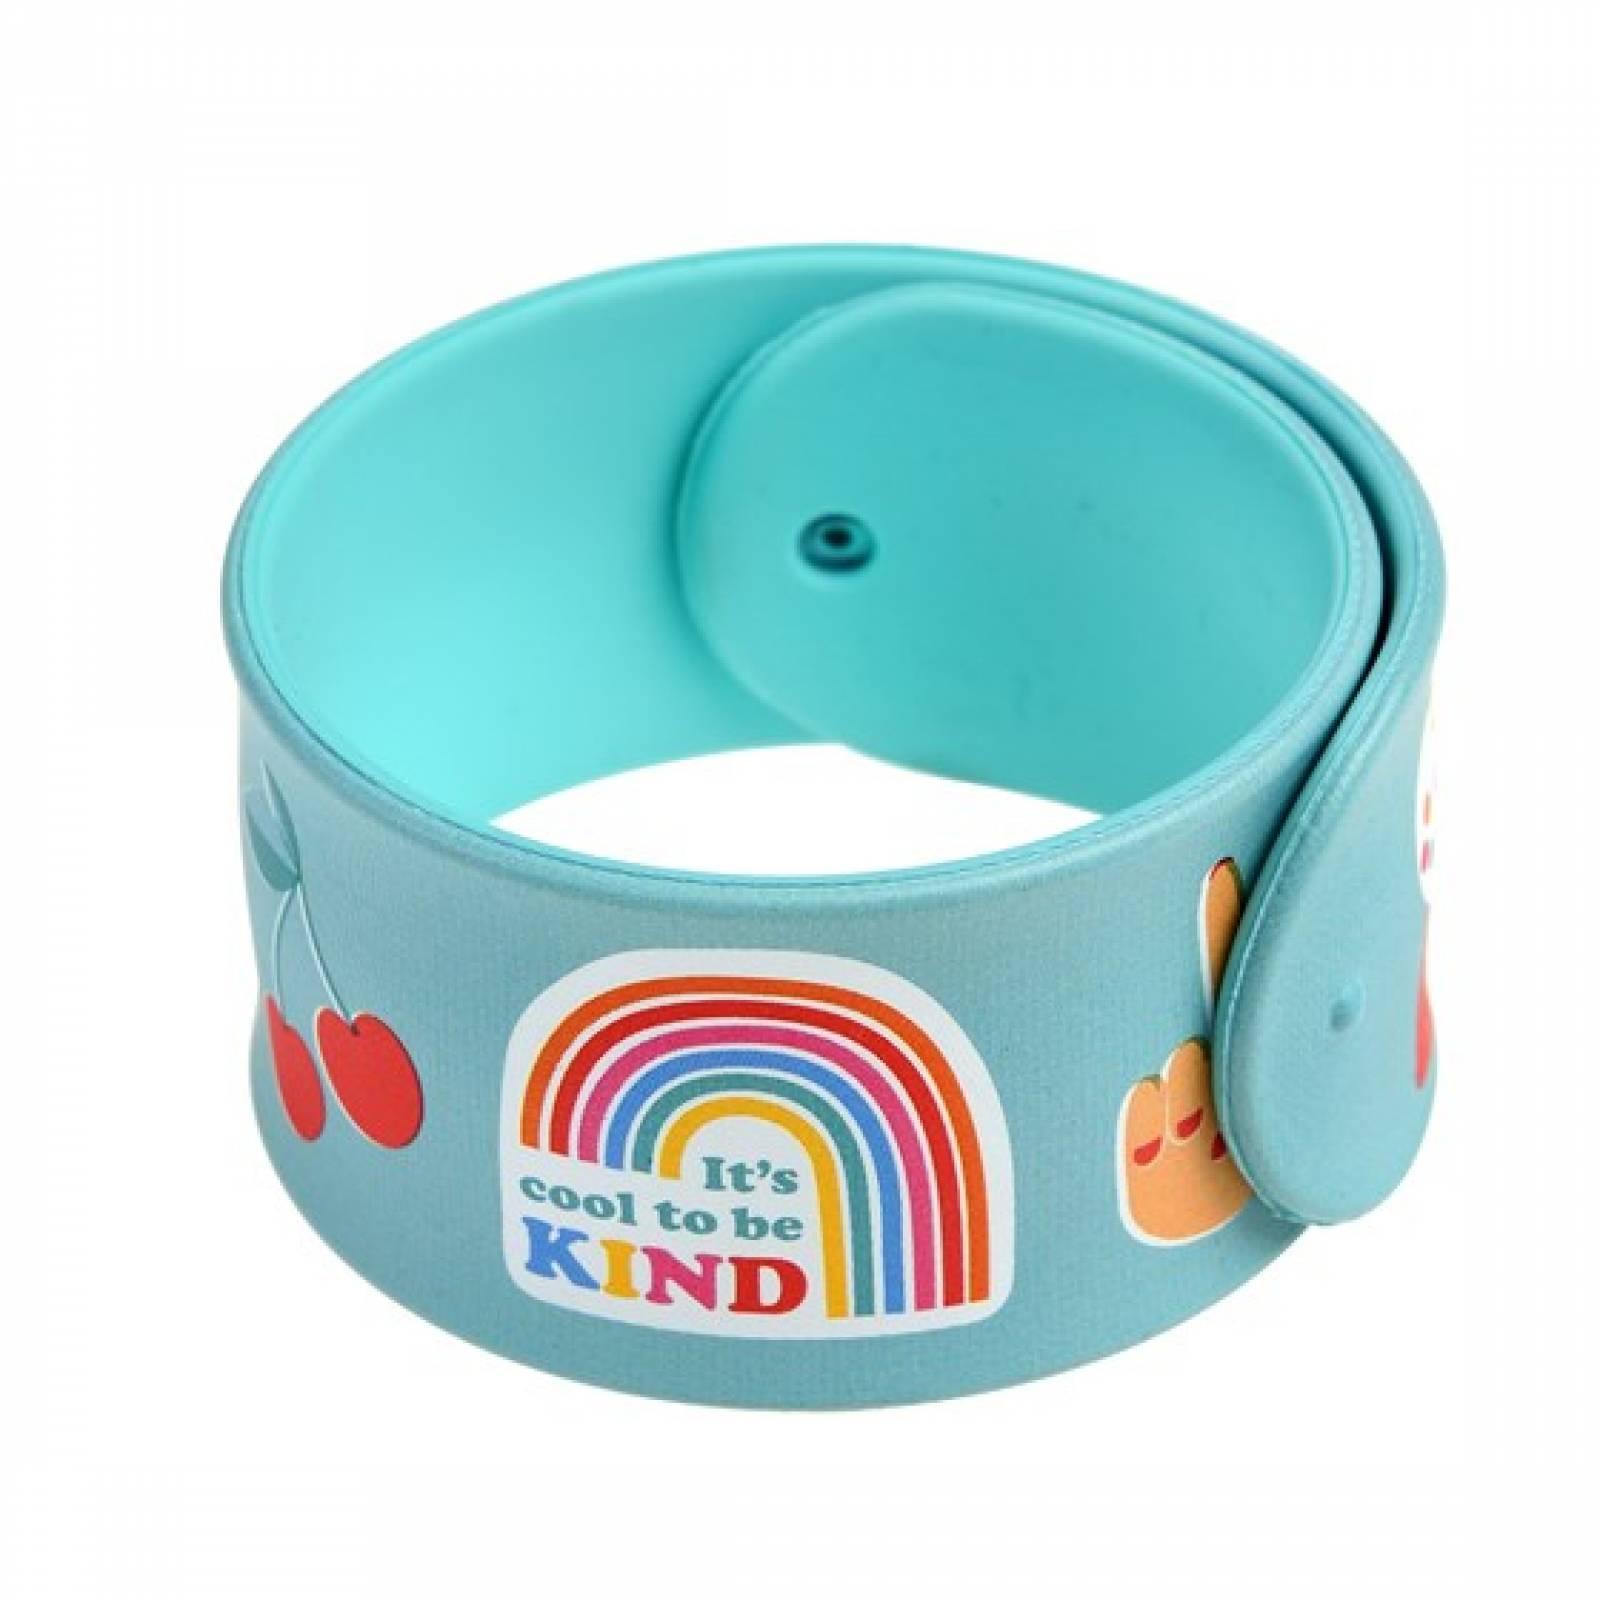 Childrens Snap Band Bracelet - Top Banana thumbnails